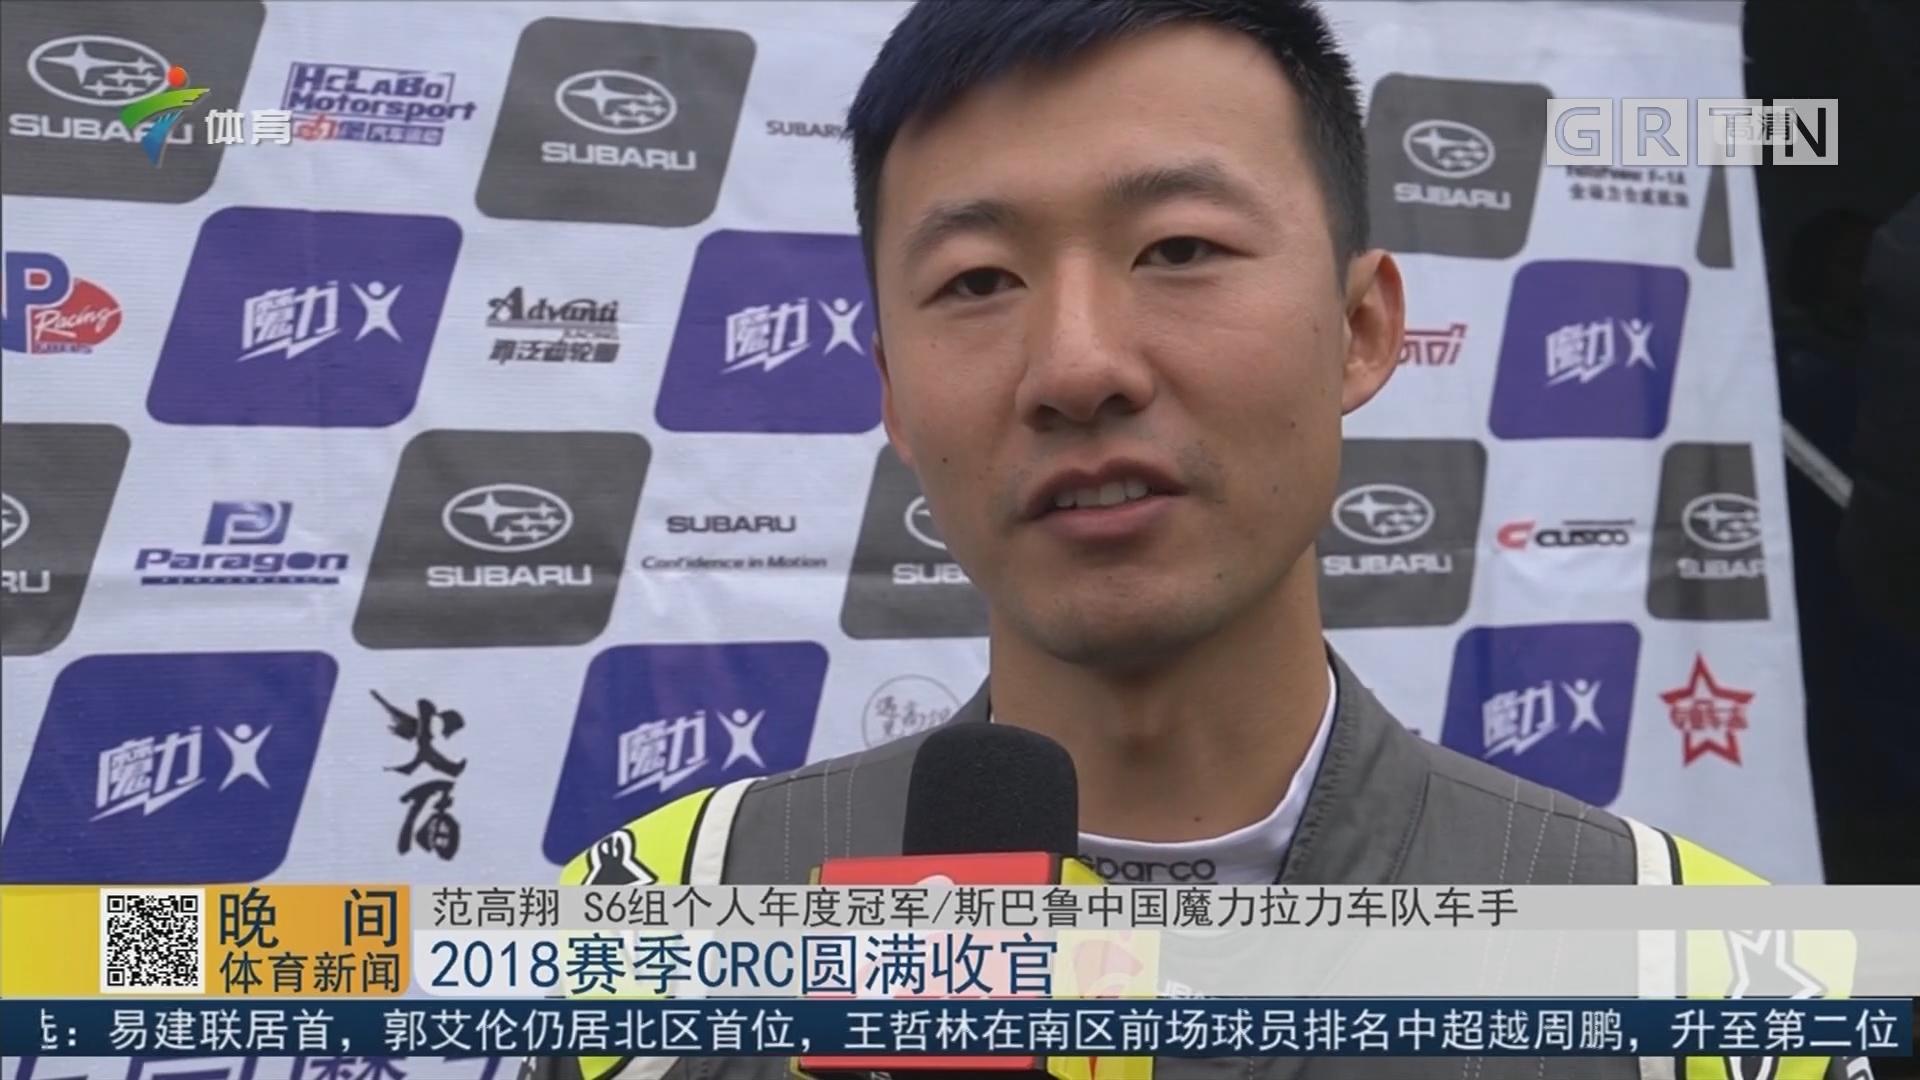 2018赛季CRC圆满收官